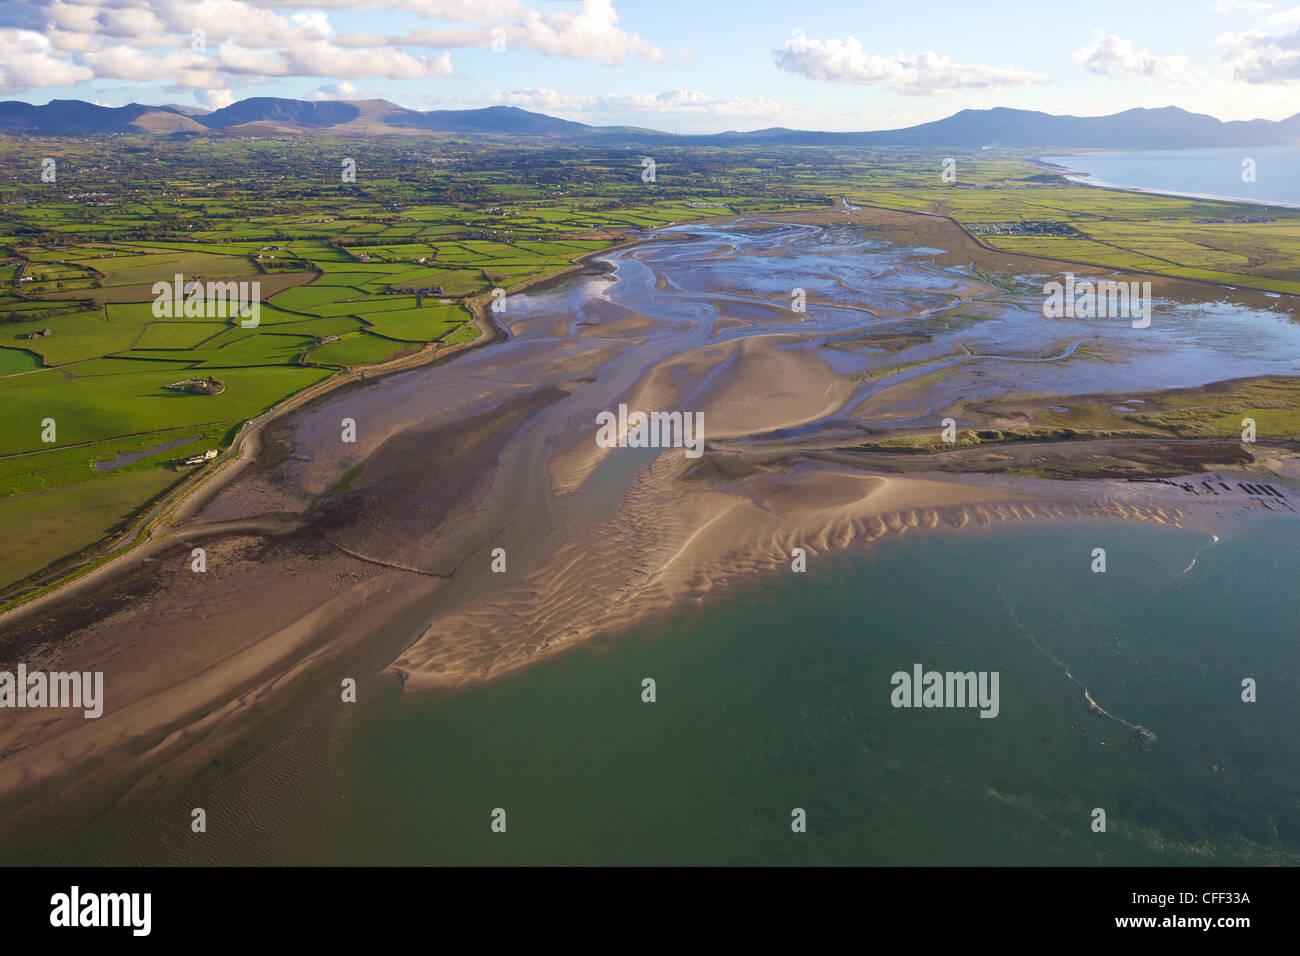 Aerial photograph of Foryd Bay, Menai Strait, Snowdonia, North Wales, Cymru, United Kingdom, Europe - Stock Image